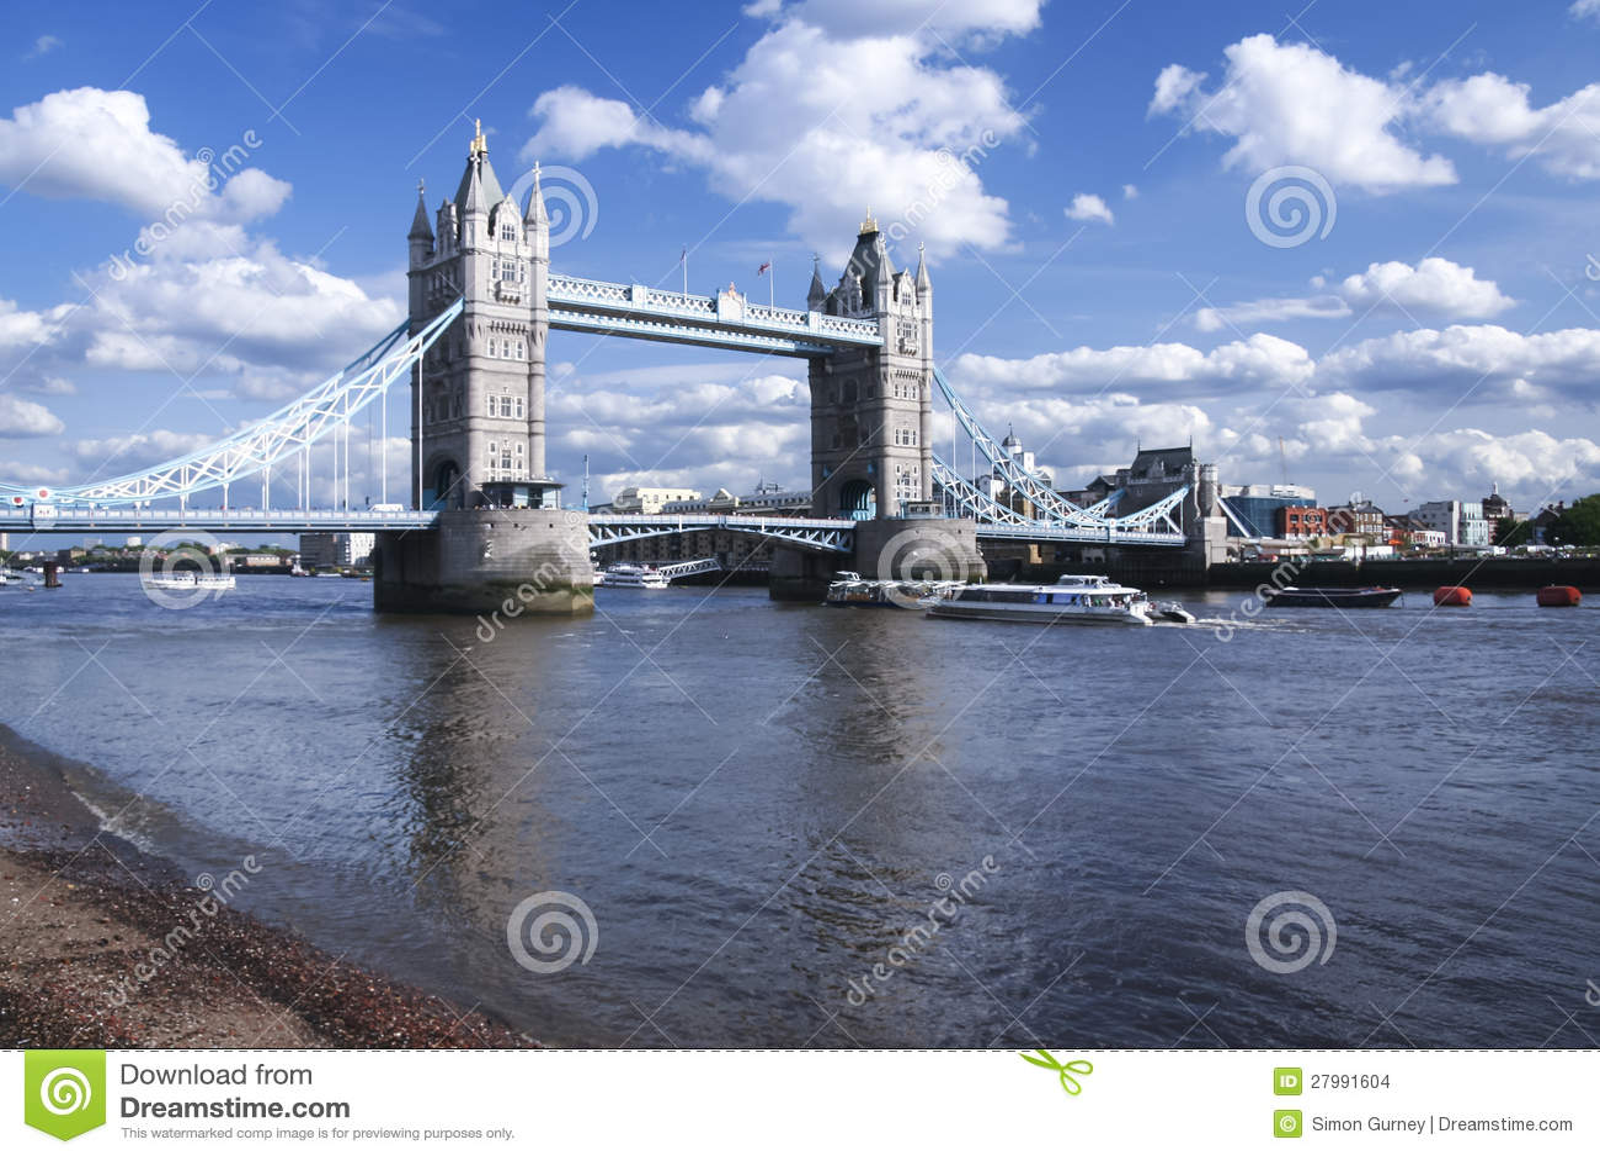 Tower bridge river thames london city uk